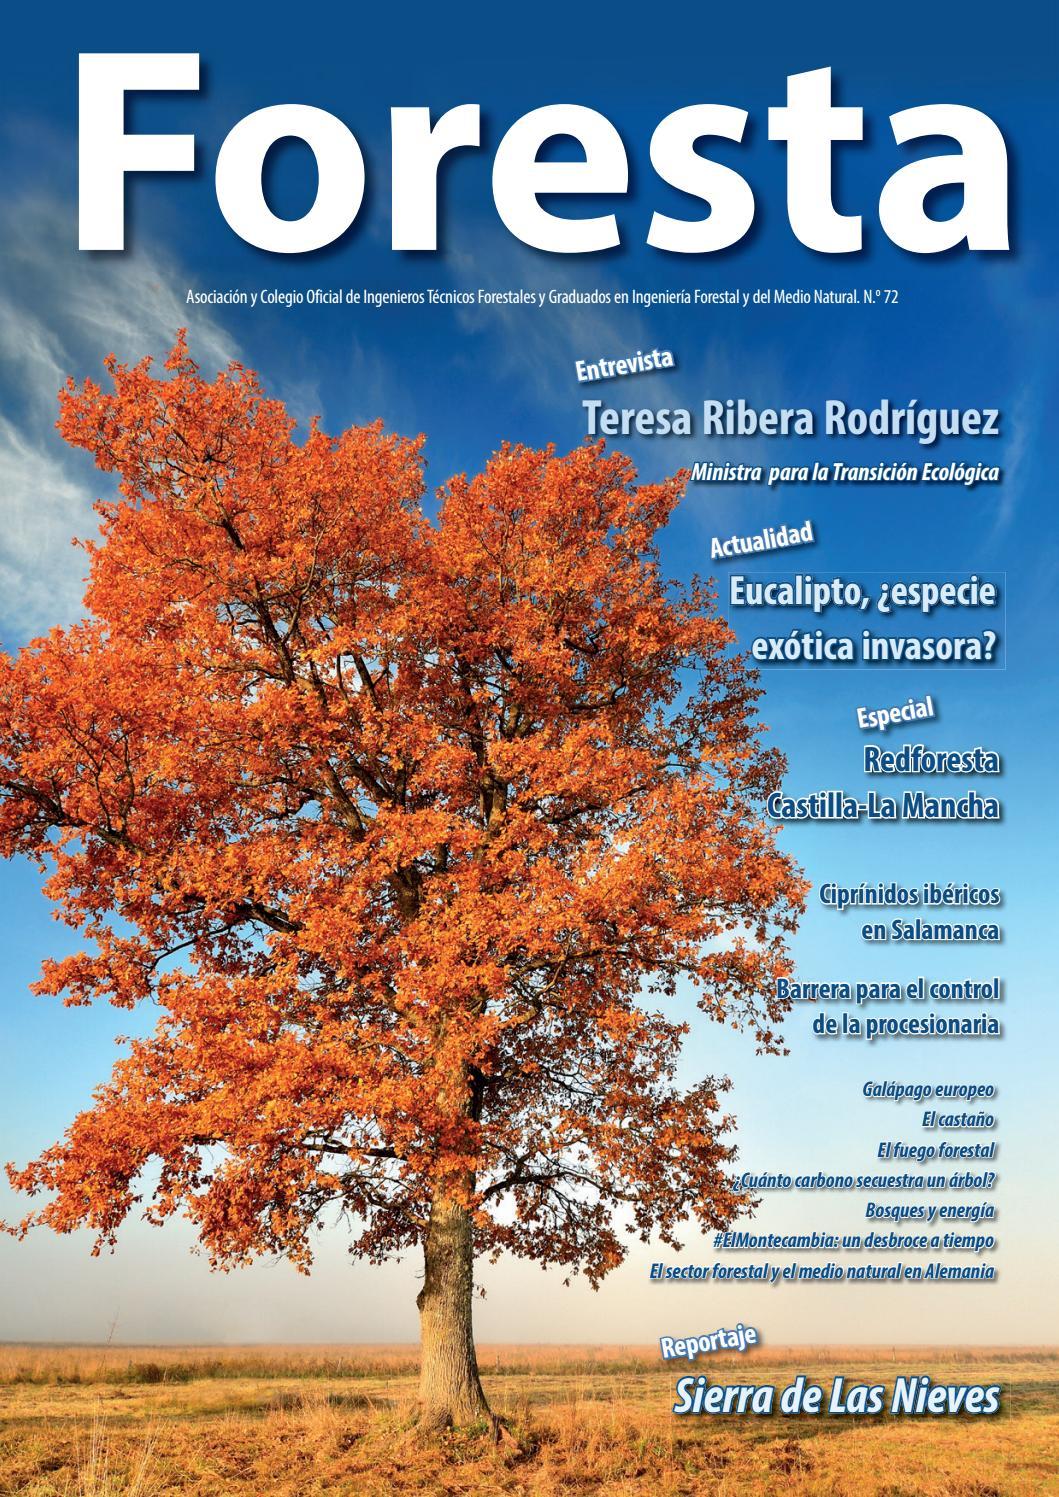 Revista Foresta nº 72 by Foresta - issuu f93d145772b